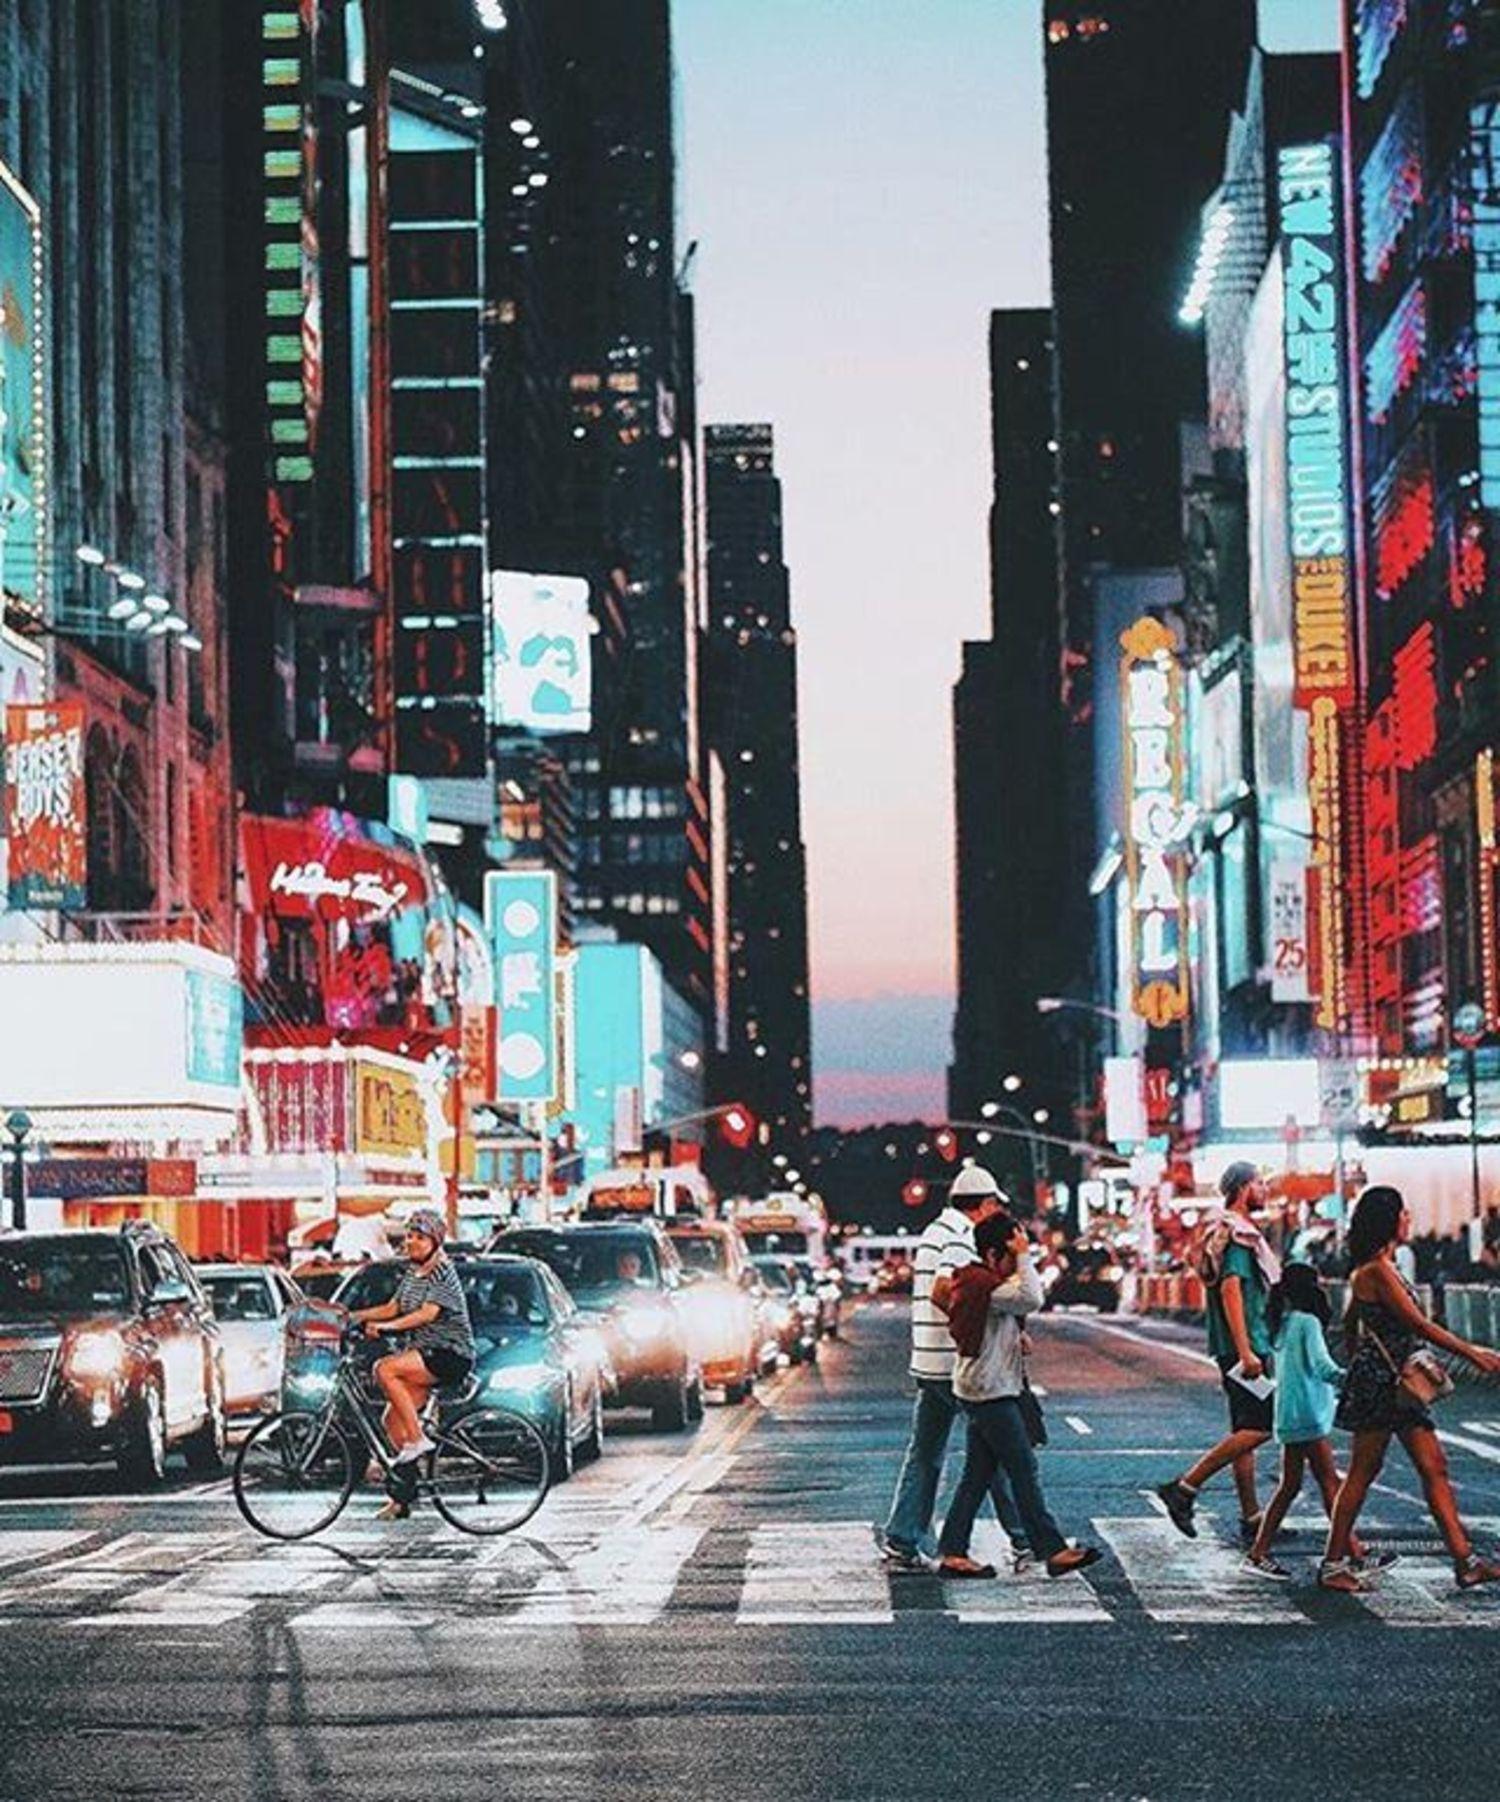 New York, New York. Photo via @golden2dew #viewingnyc #newyorkcity #newyork